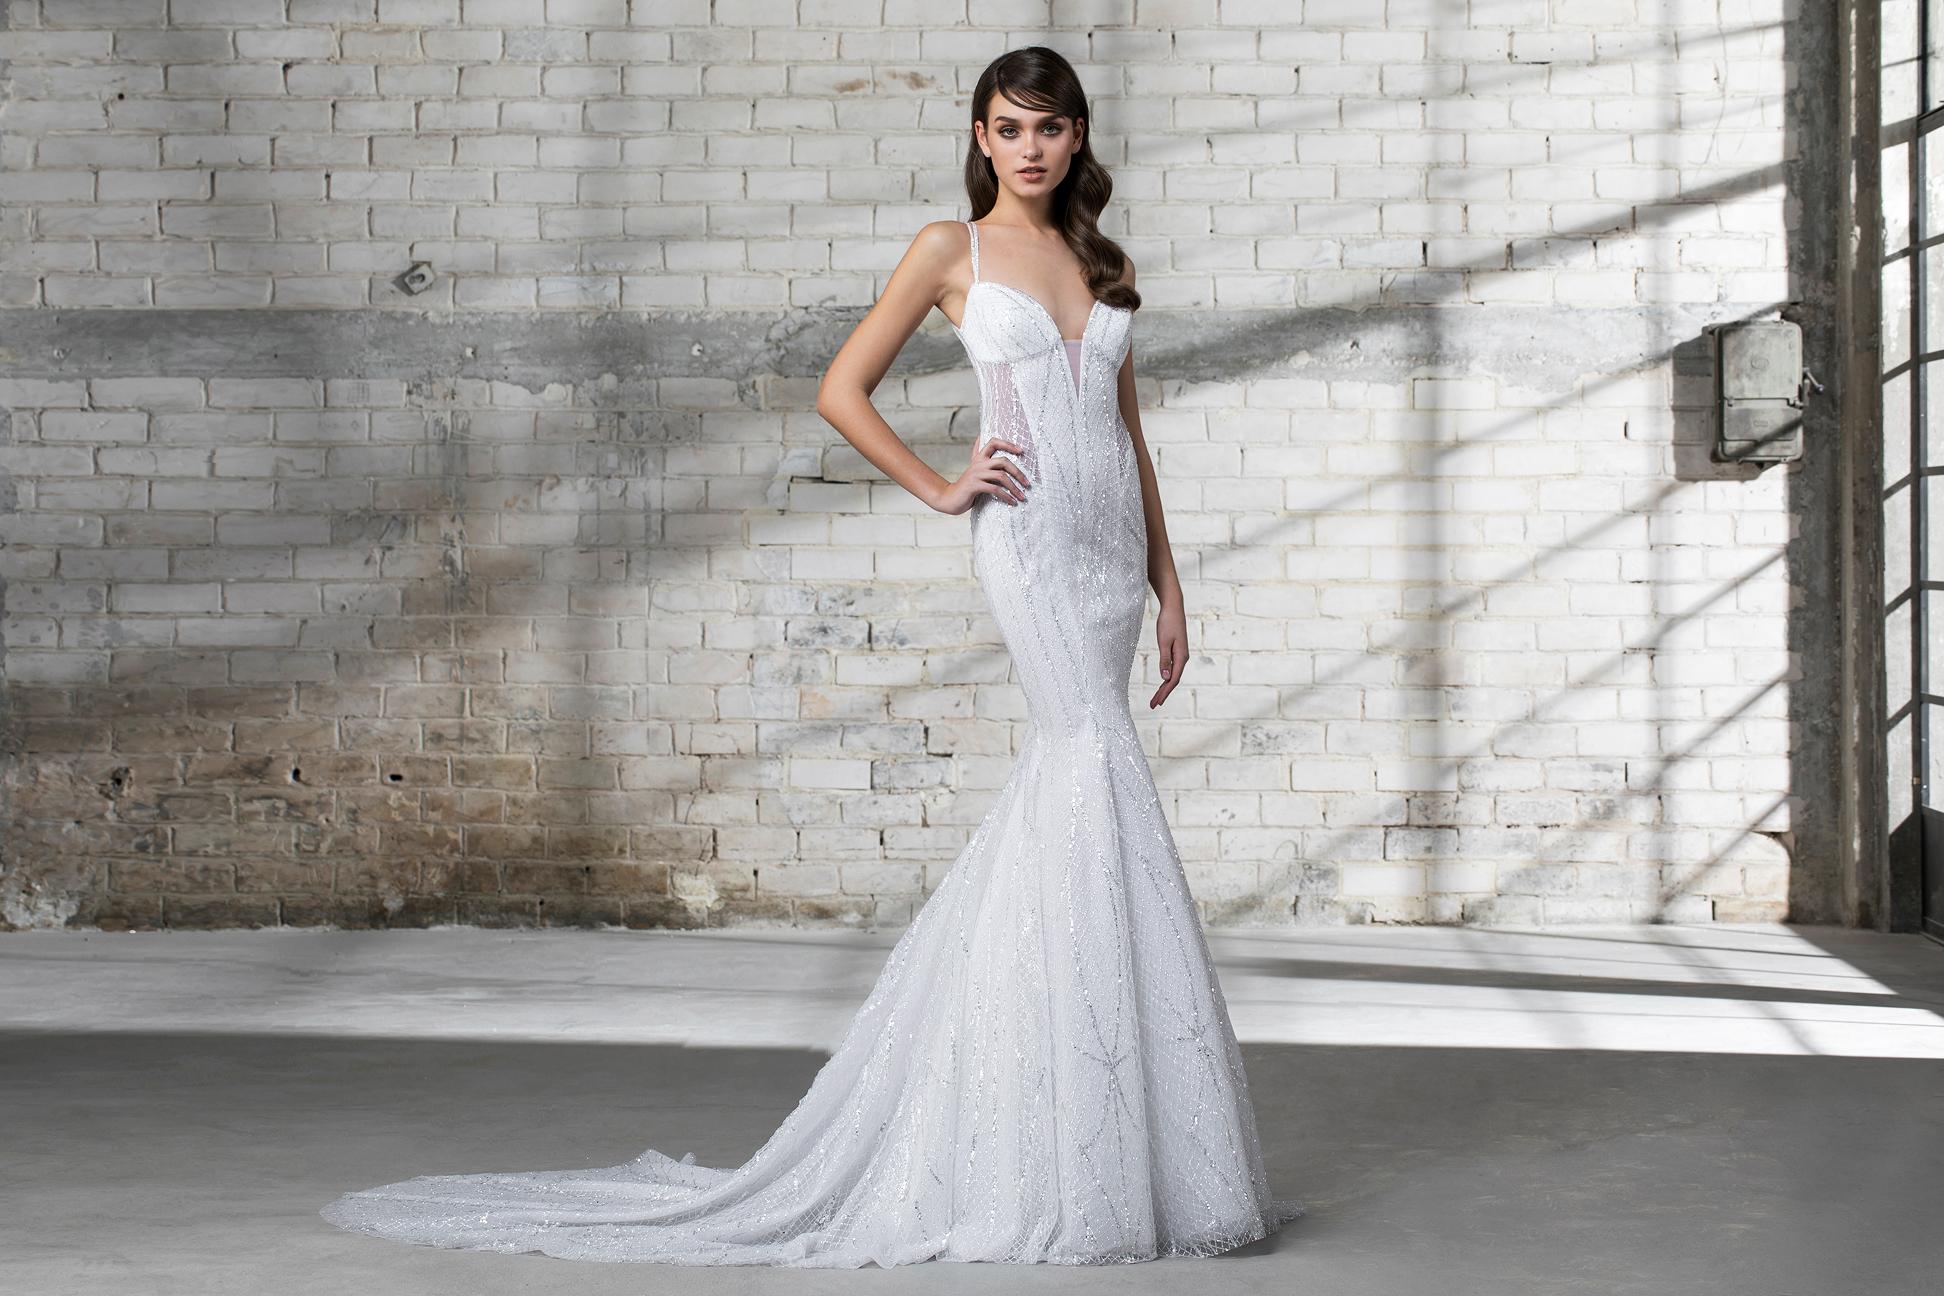 pnina tornai wedding dress spring 2019 spaghetti strap trumpet